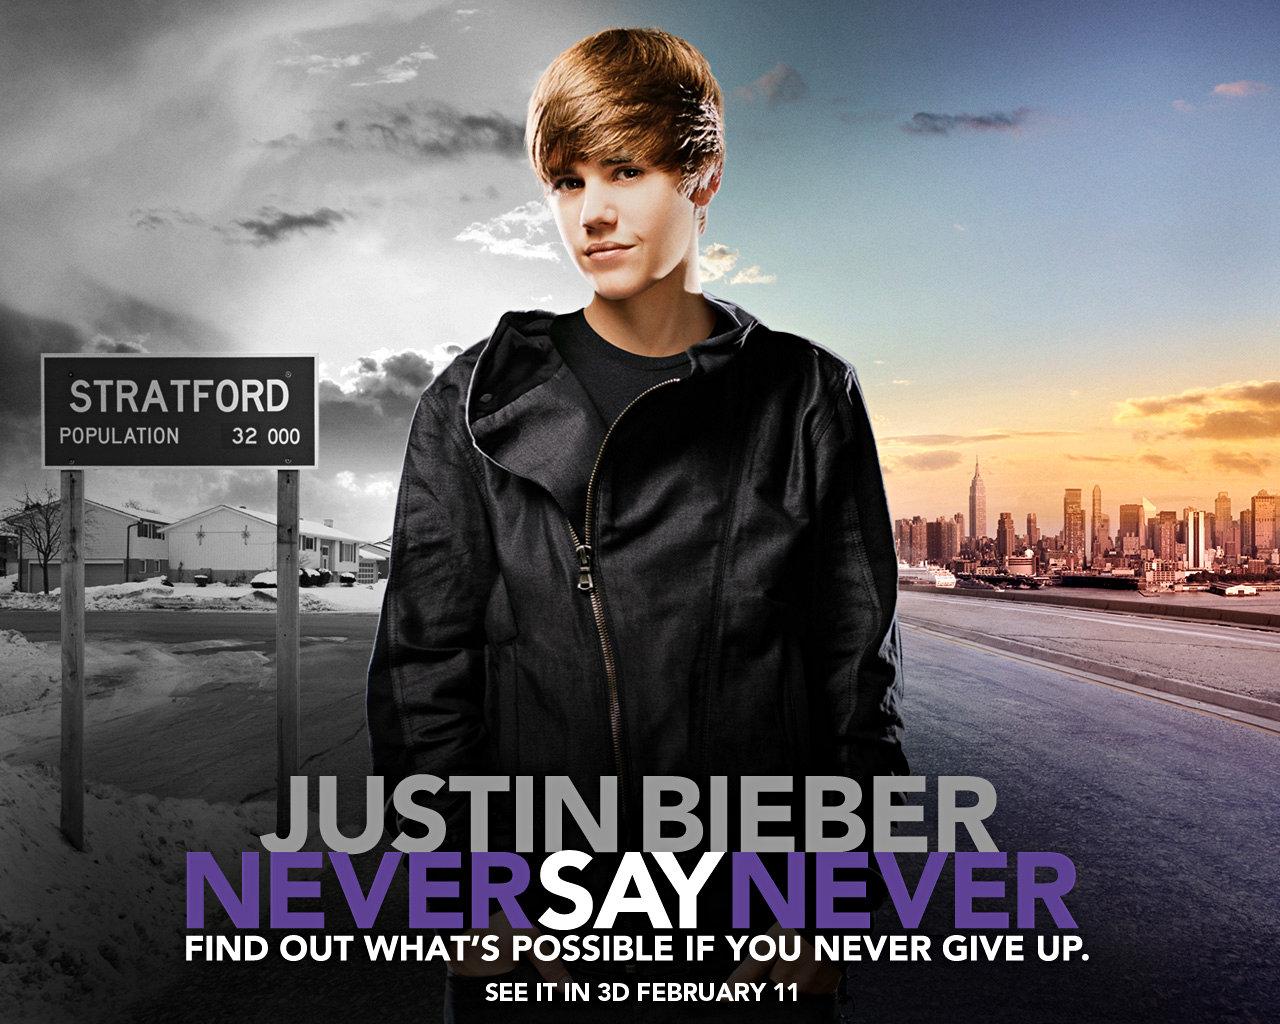 Justin Bieber Never Say Never Wallpaper 10025084 Desktop